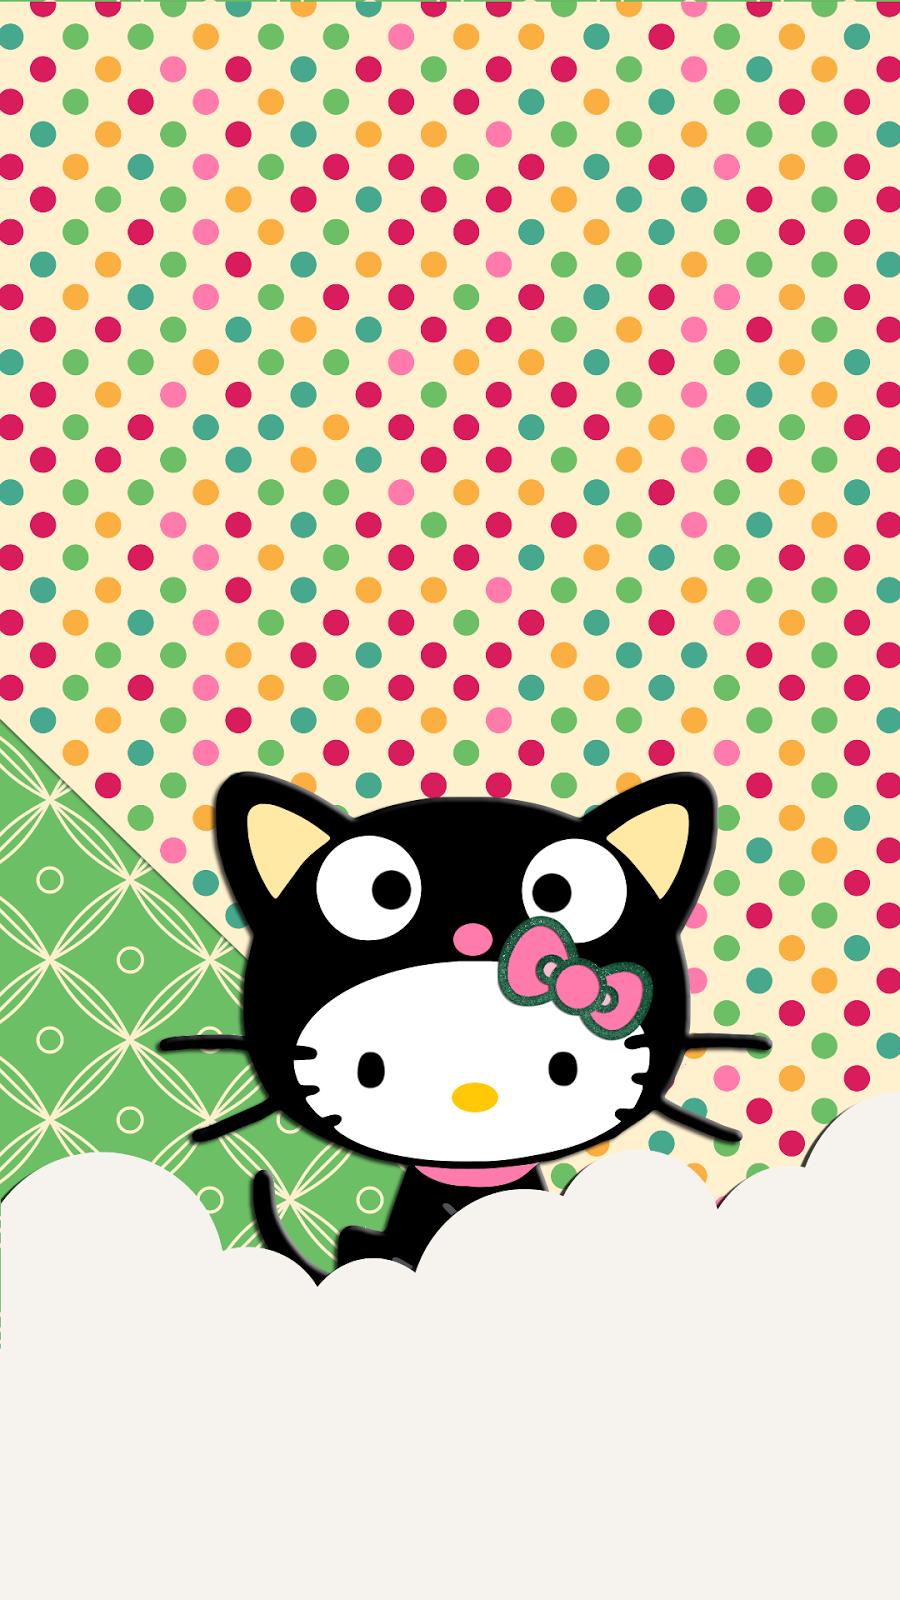 Hello Kitty As Choco Cat Wallpaper Wallpaper Love Pinterest